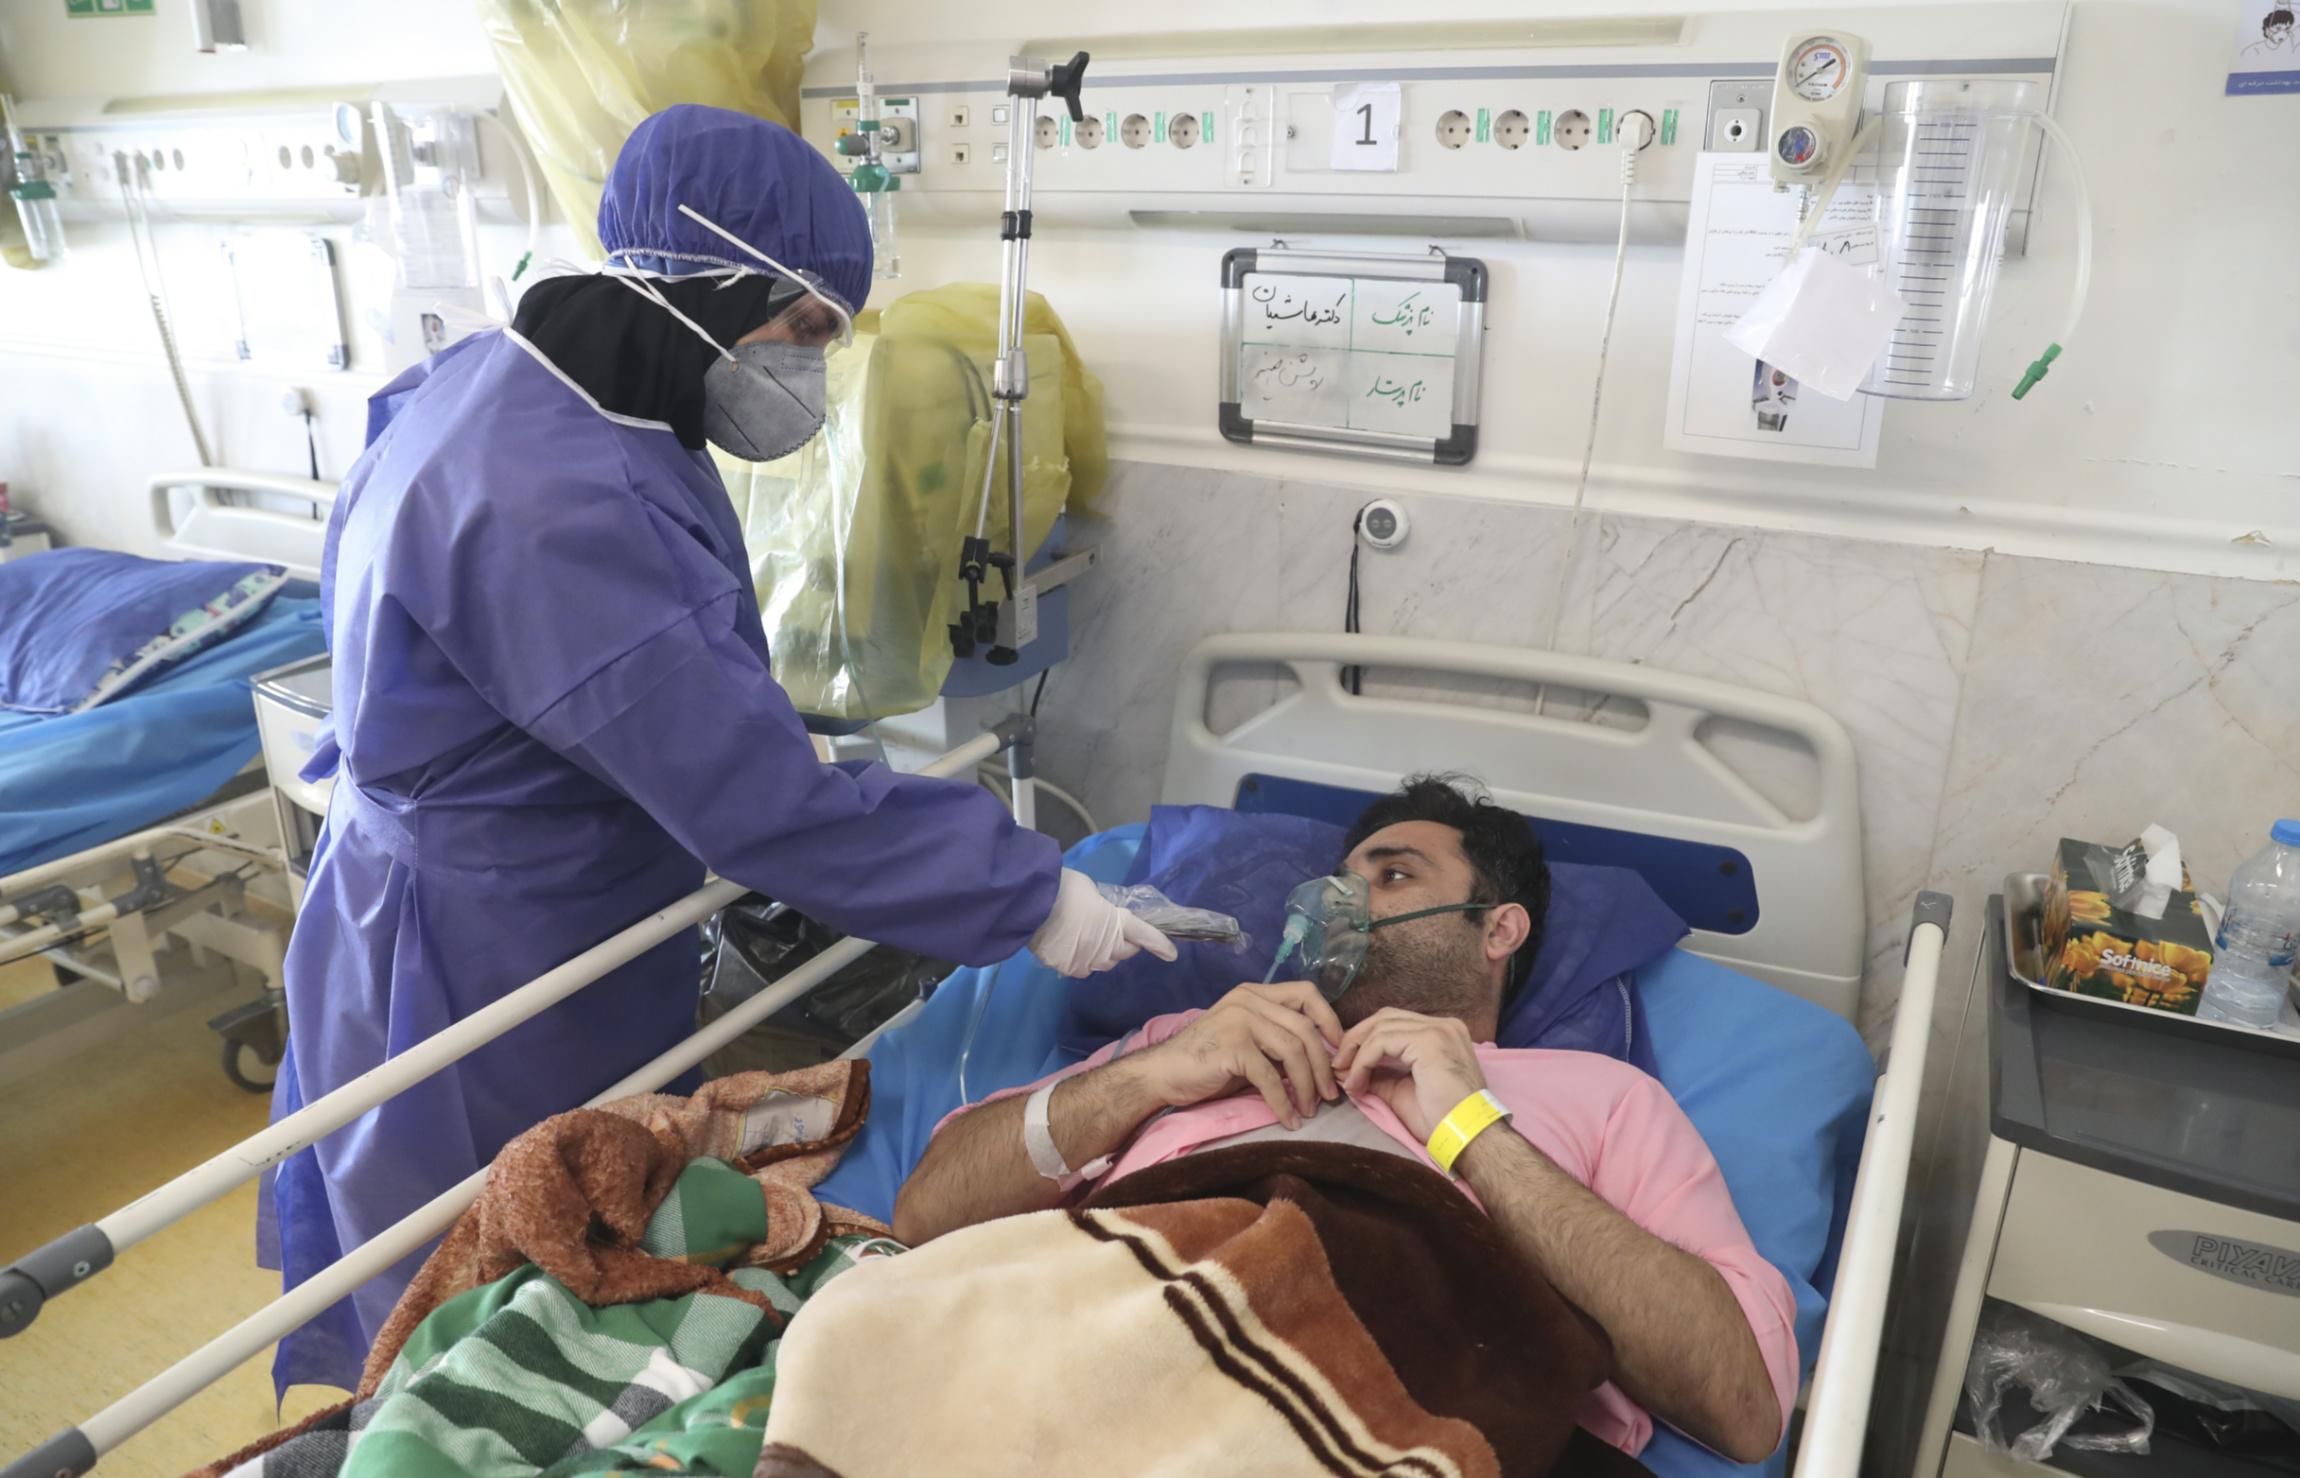 Masih Daneshvari Hospital, Iran, coronavirus